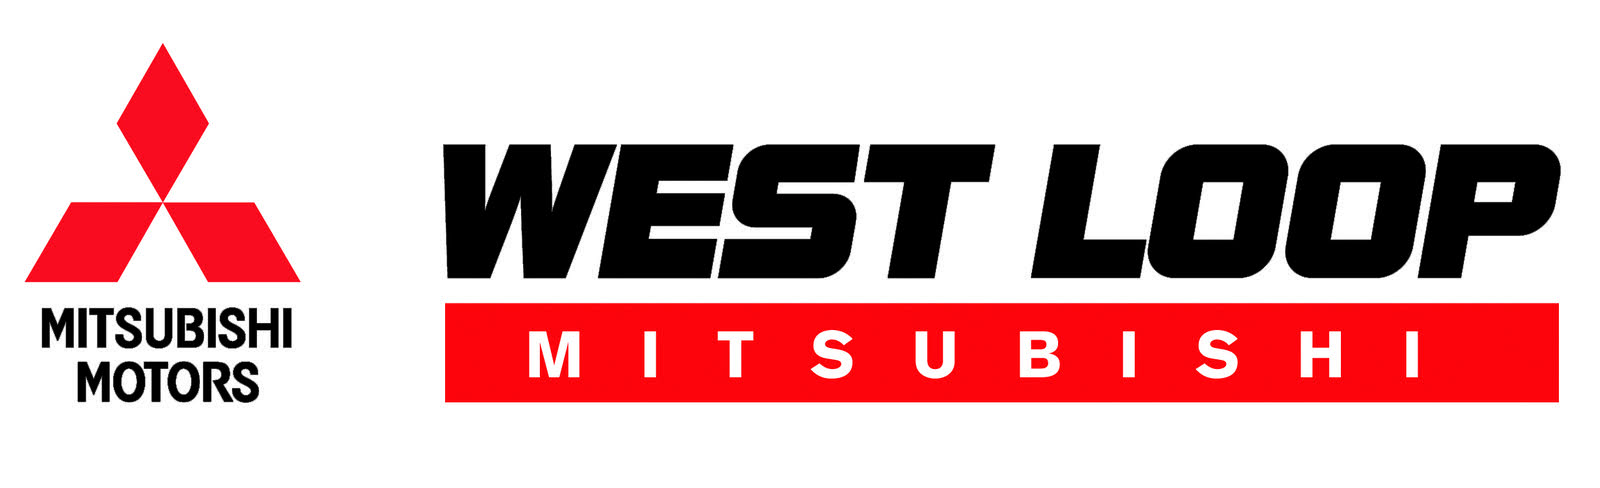 West Loop Mitsubishi San Antonio Tx >> West Loop Mitsubishi - San Antonio, TX: Read Consumer reviews, Browse Used and New Cars for Sale